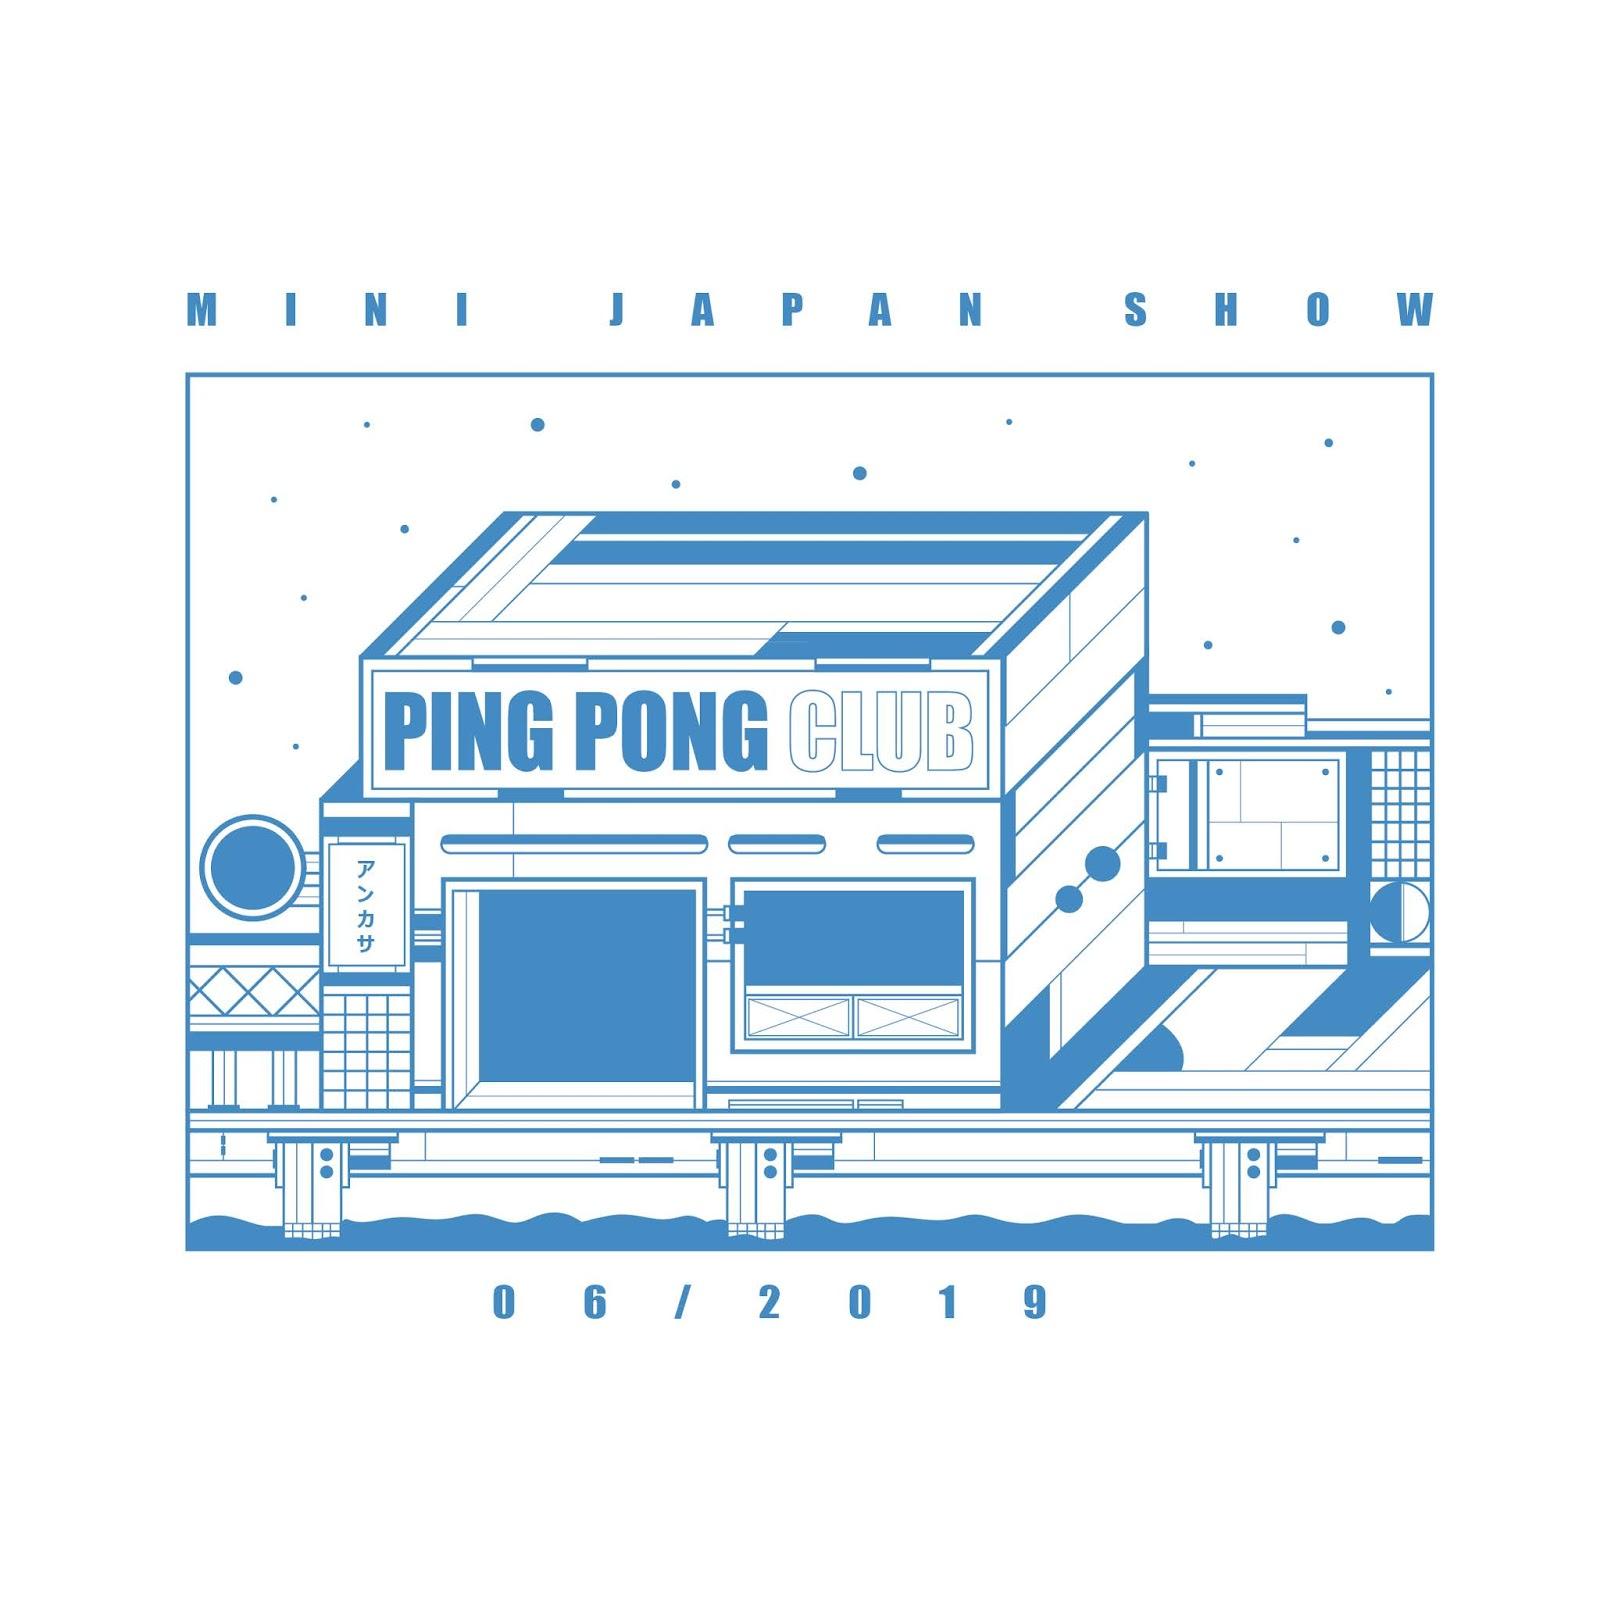 terbang-ke-jepang-moment-perdana-ping-pong-club-di-ranah-internasional